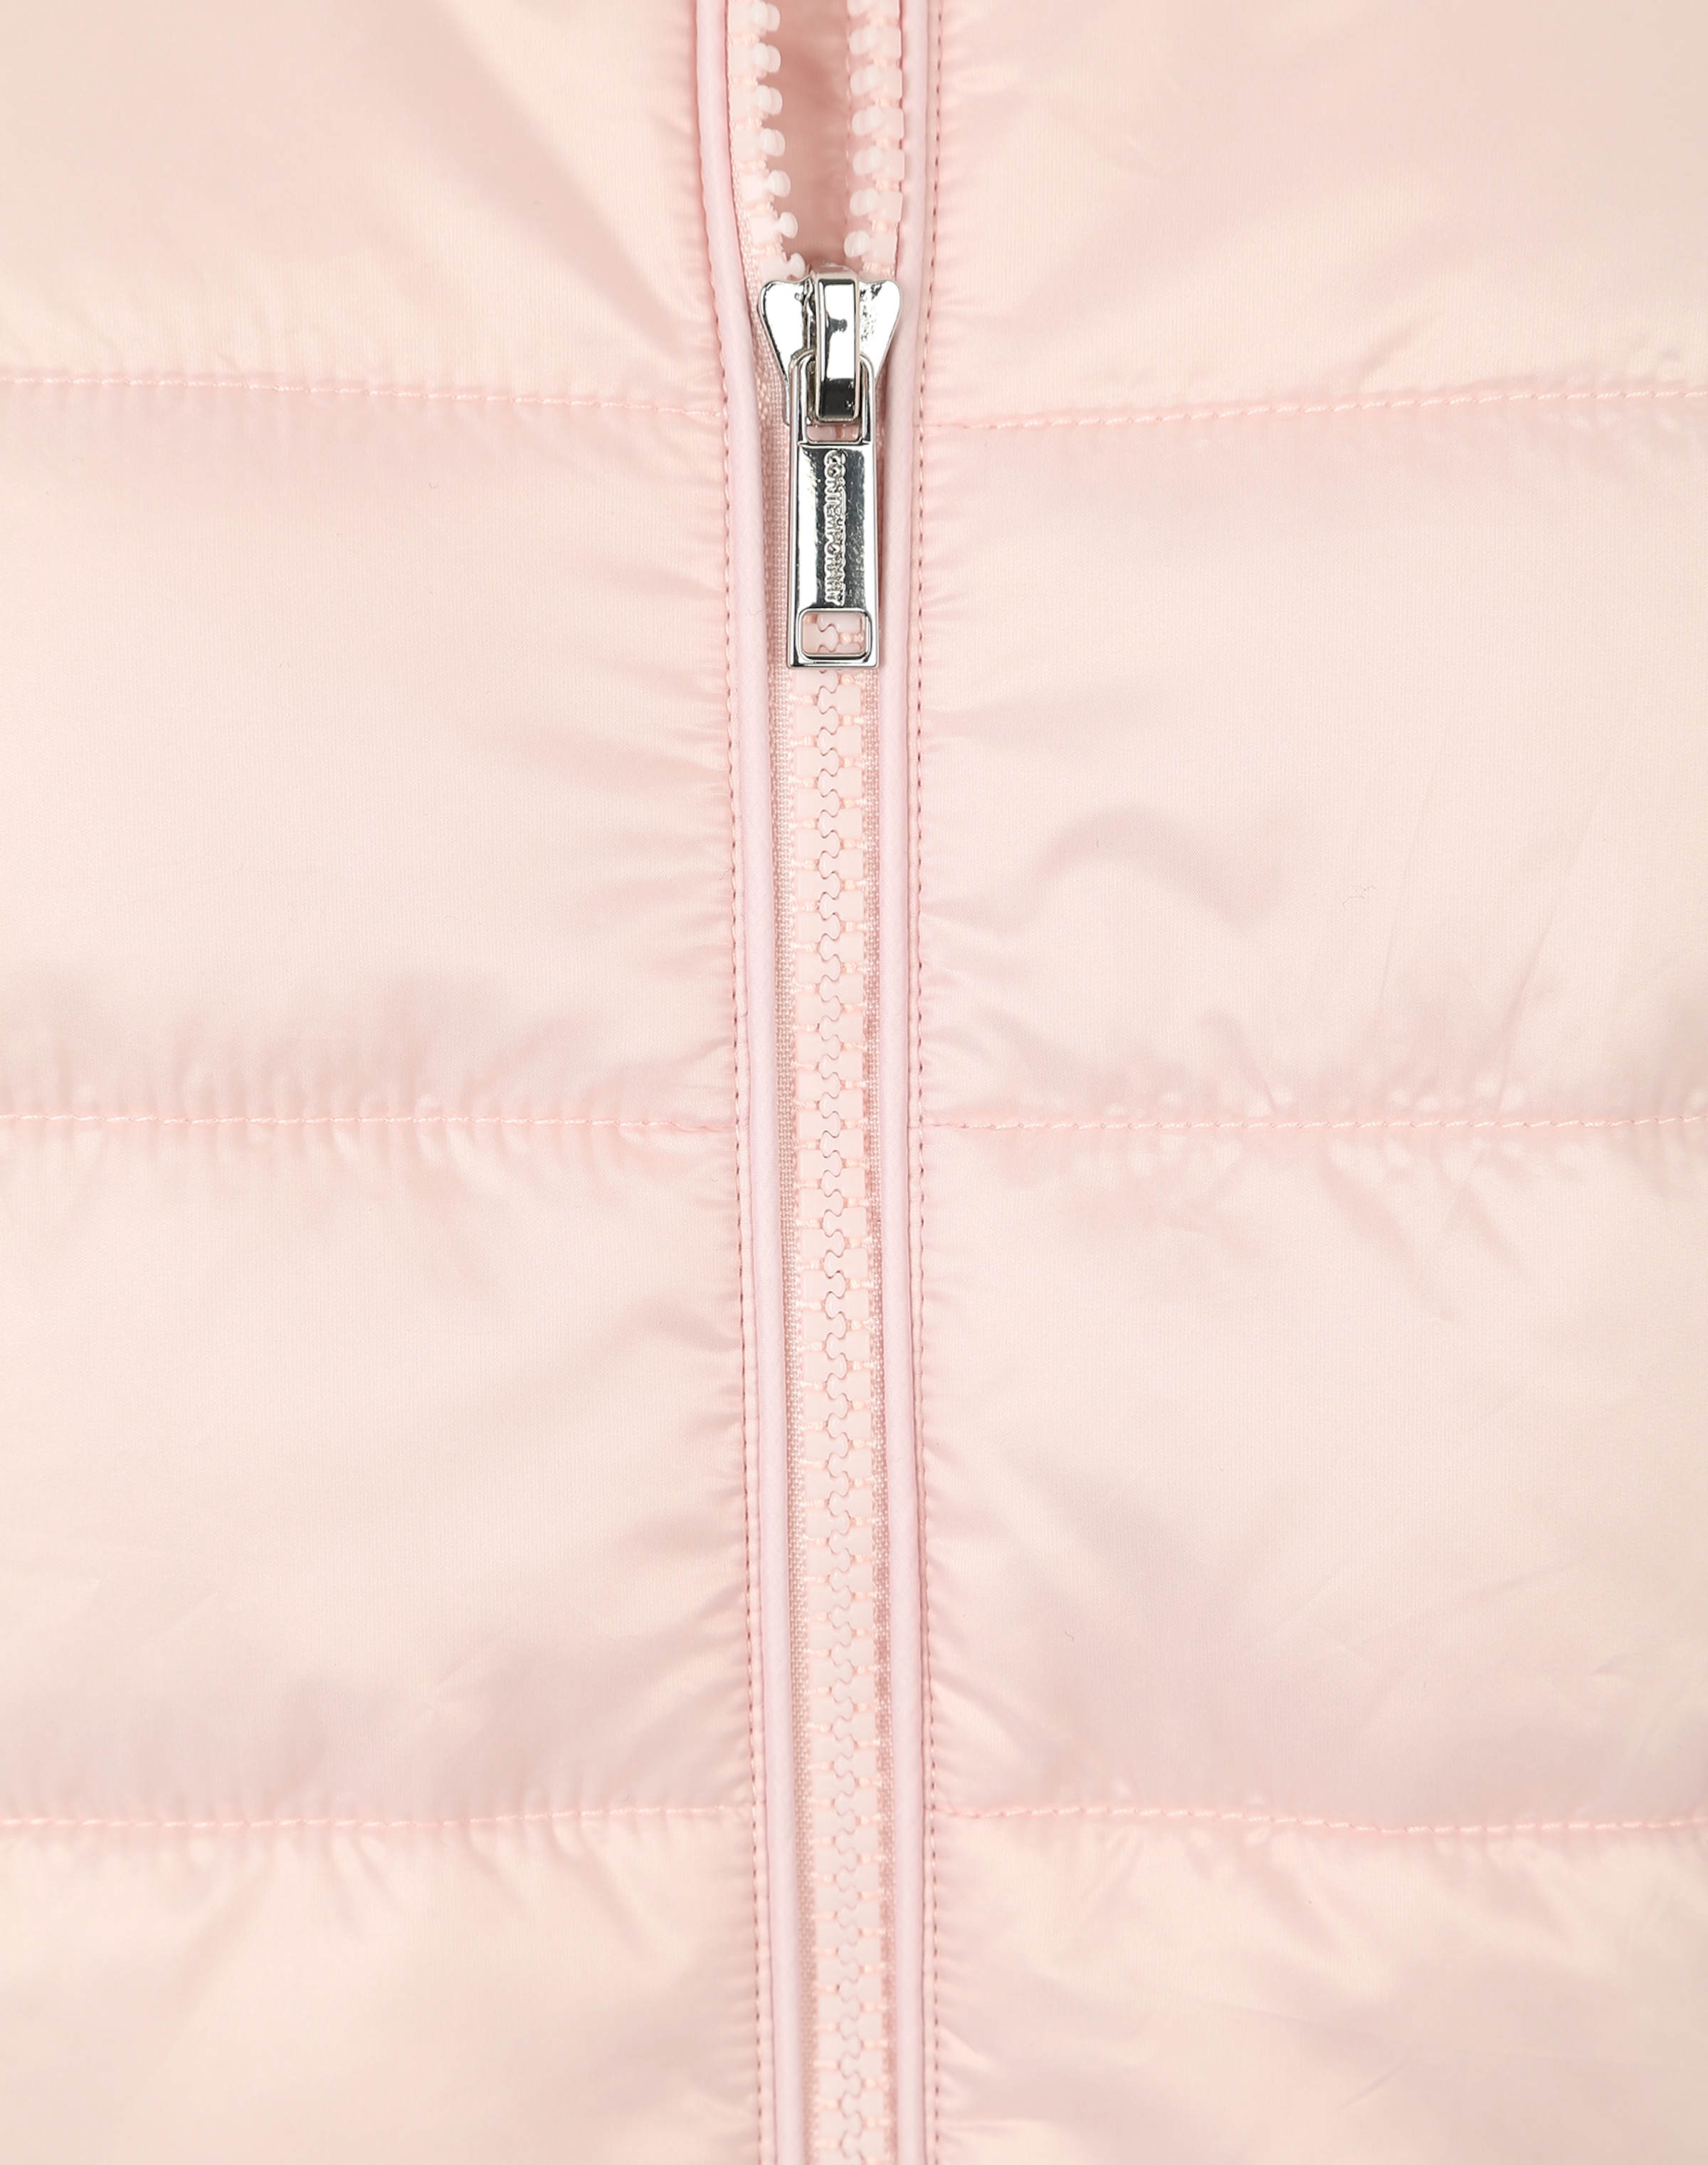 Günstig Kaufen Ebay Tom Tailor Contemporary Steppjacke Verkauf Sammlungen Billige Fälschung V473W7pa